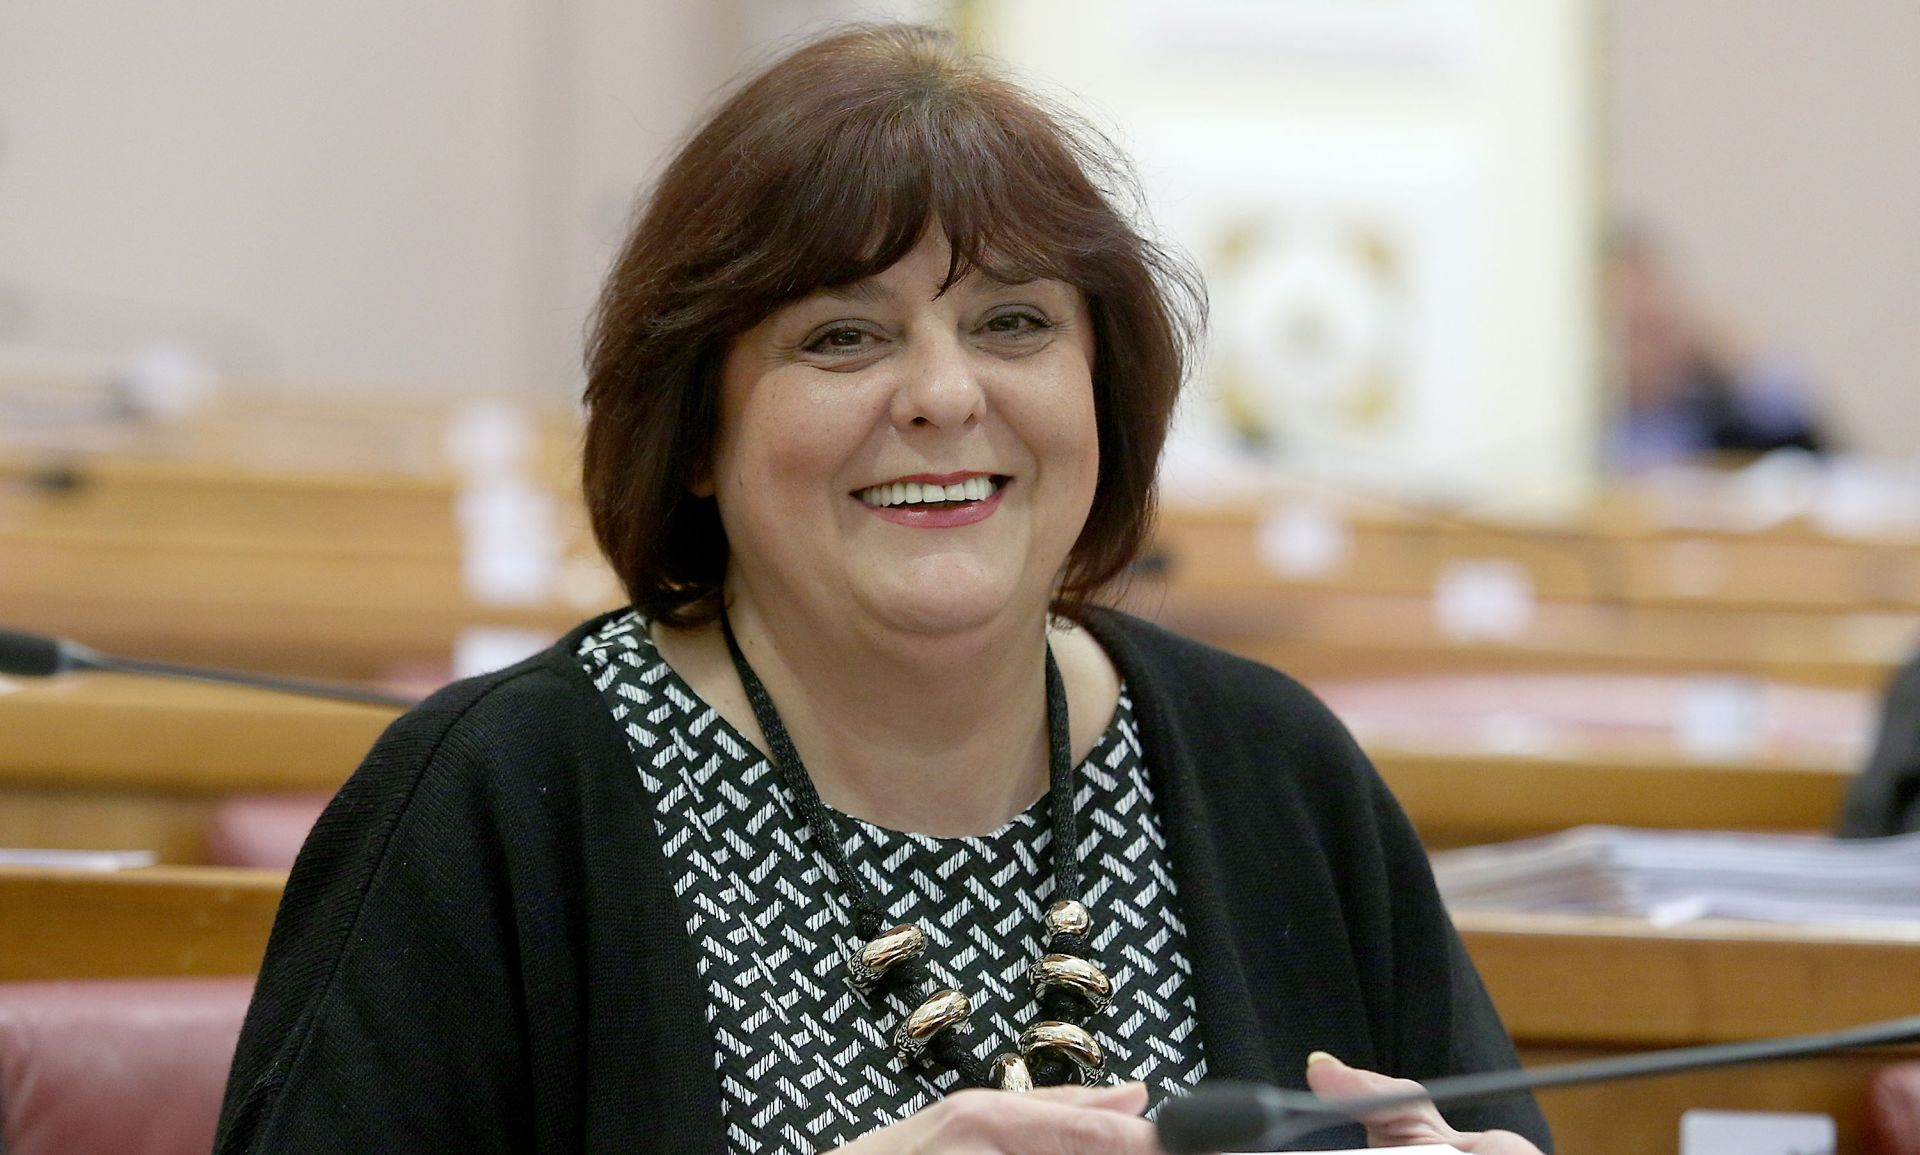 Turina Đurić (HNS): Neka predsjednica lupi šakom o stol i HDZ-u kaže dosta